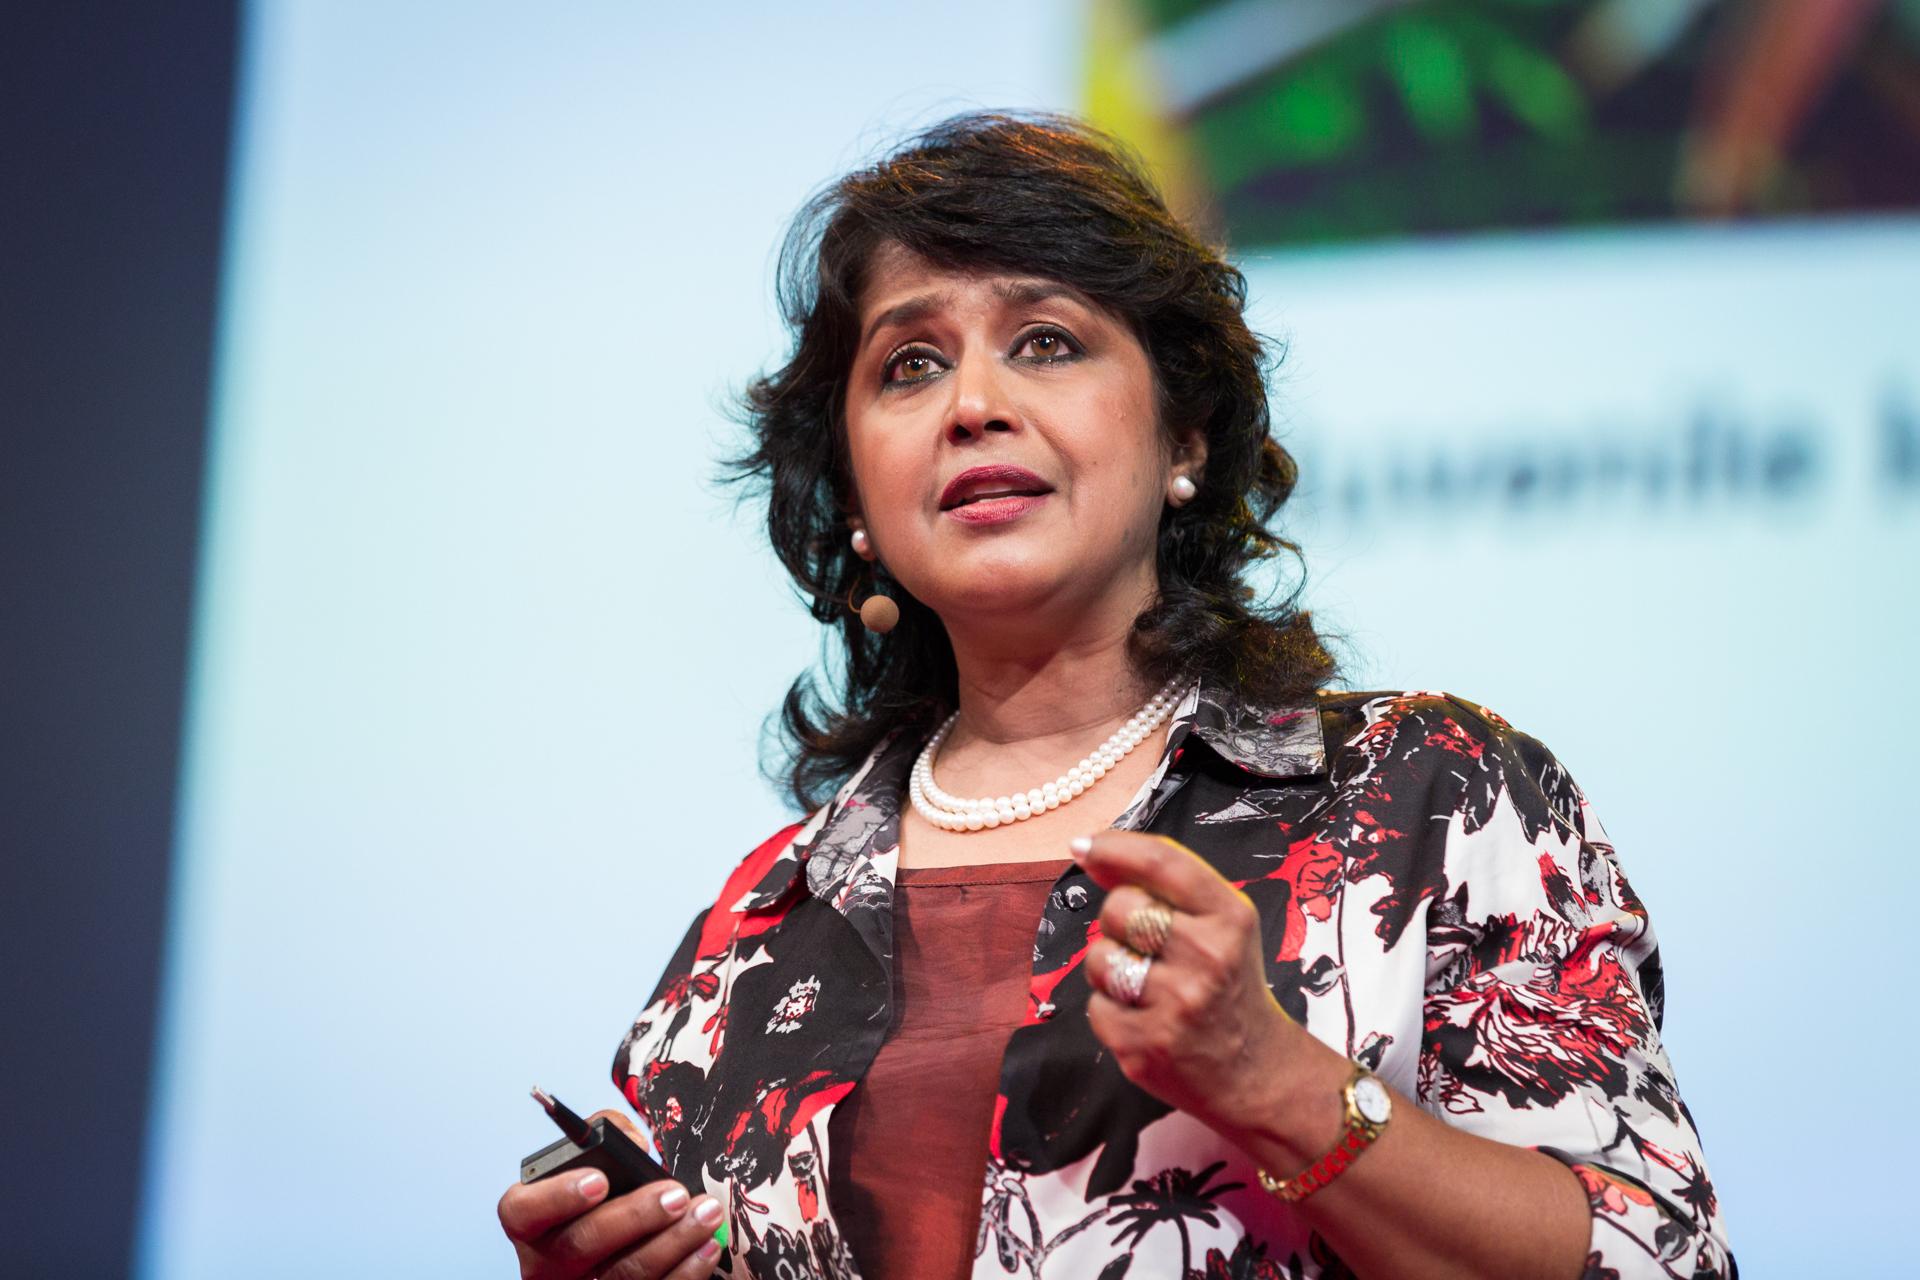 Ameenah Gurib-Fakim speaking at TEDGlobal 2014. Photo: James Duncan Davidson